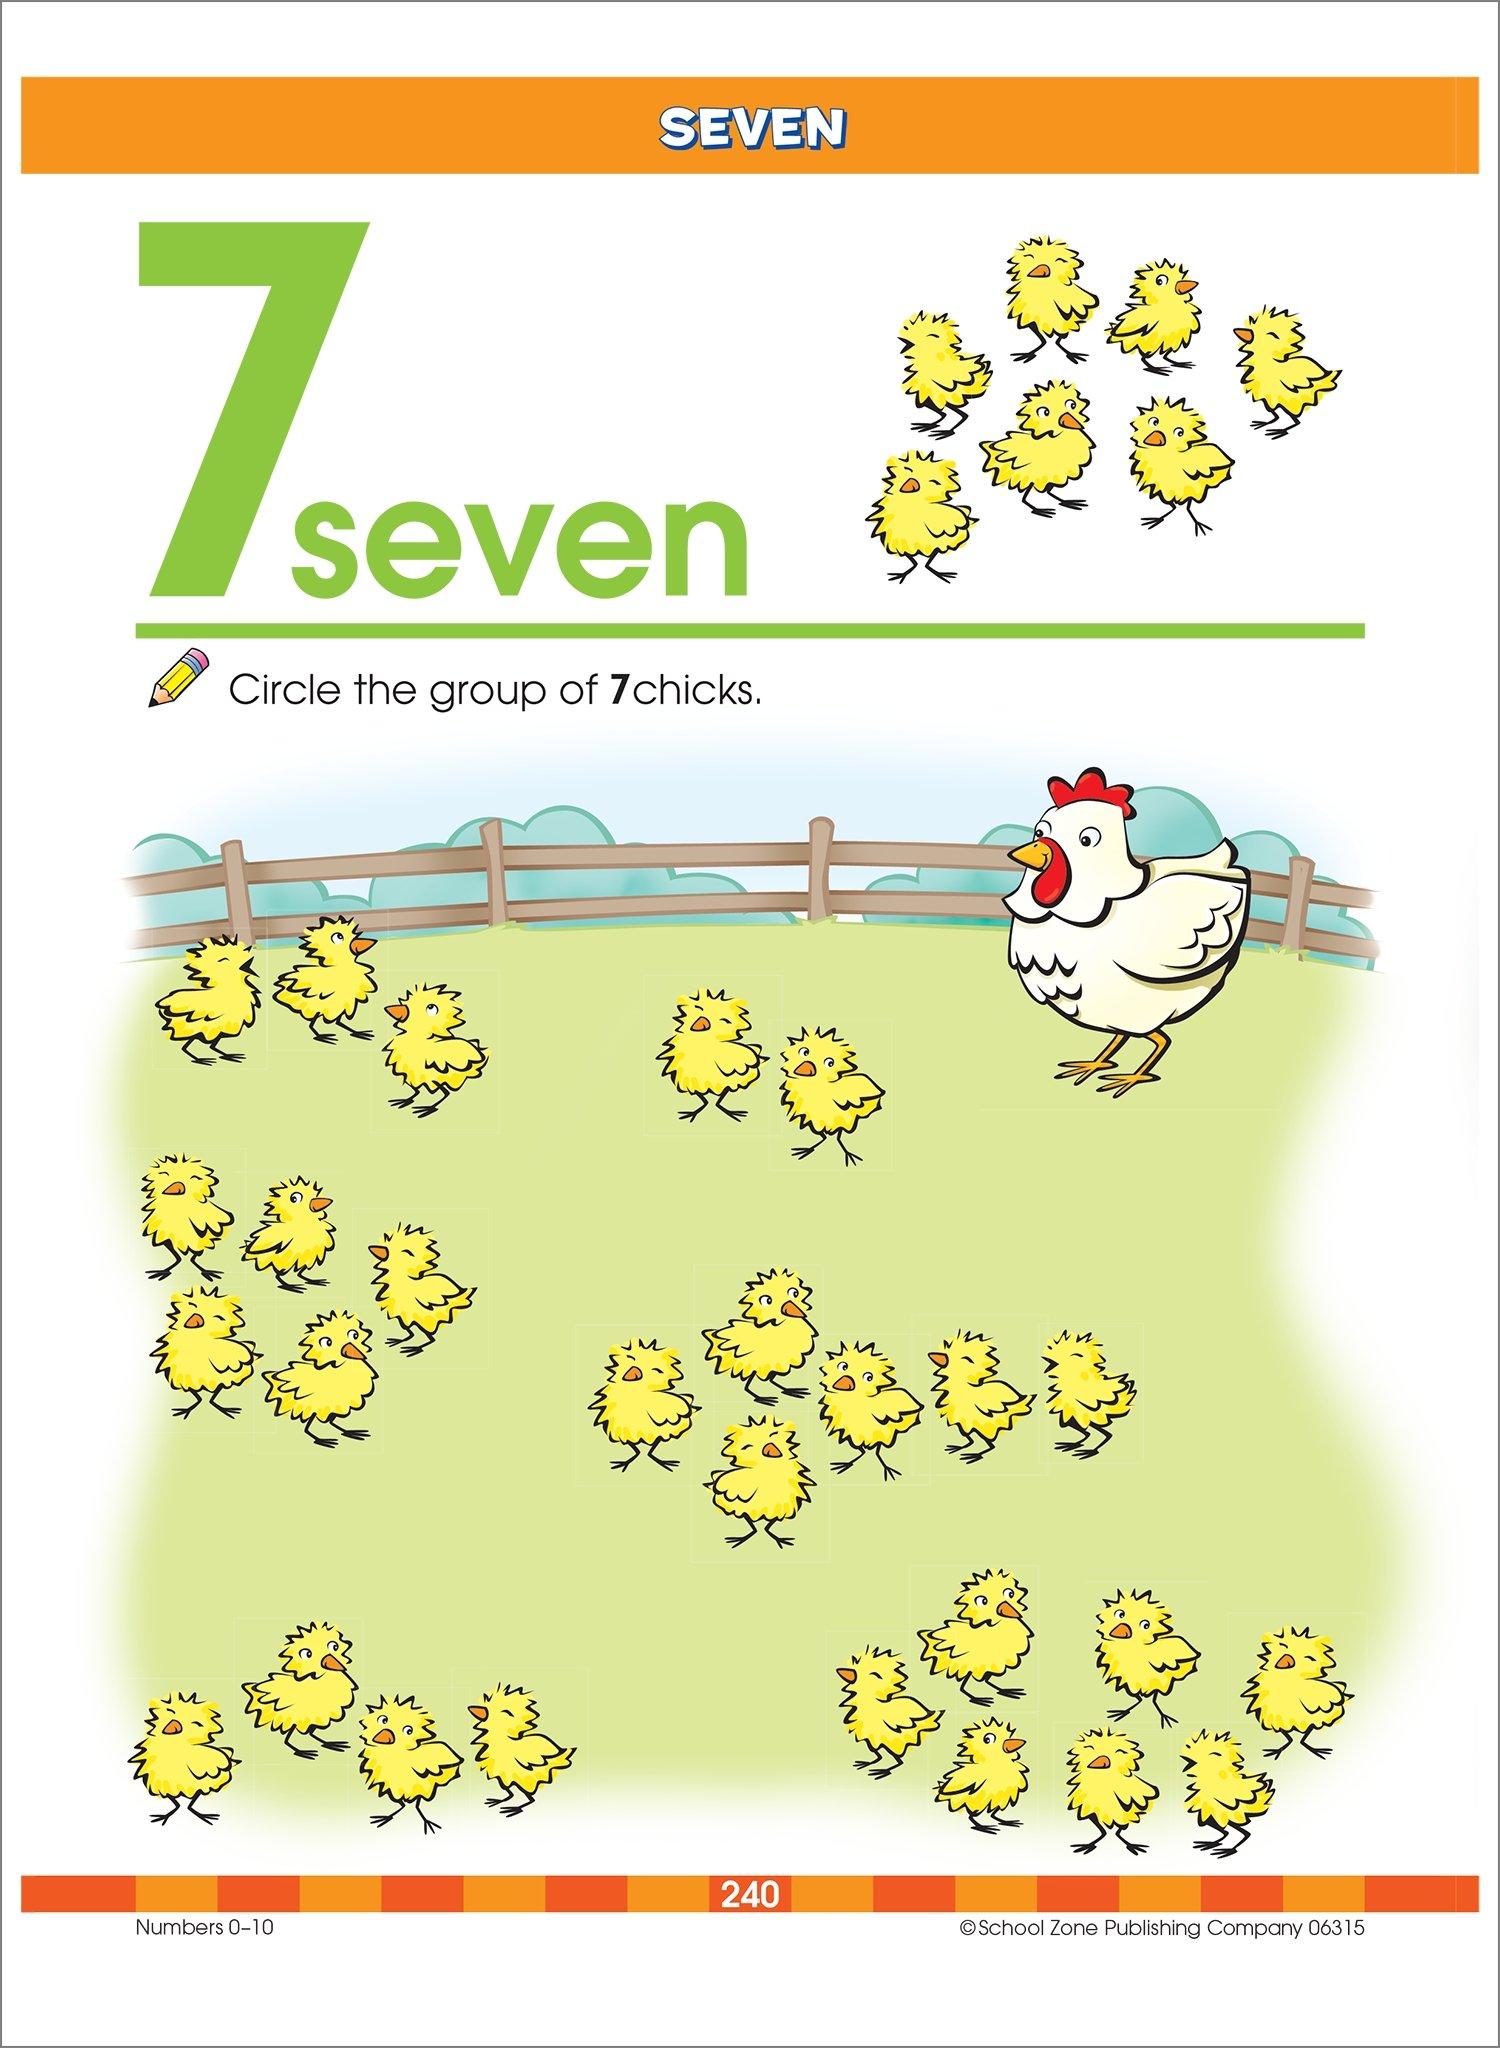 Worksheets School Zone Publishing Worksheets big preschool workbook school zone staff multiple illustrators 9780887431456 amazon com books